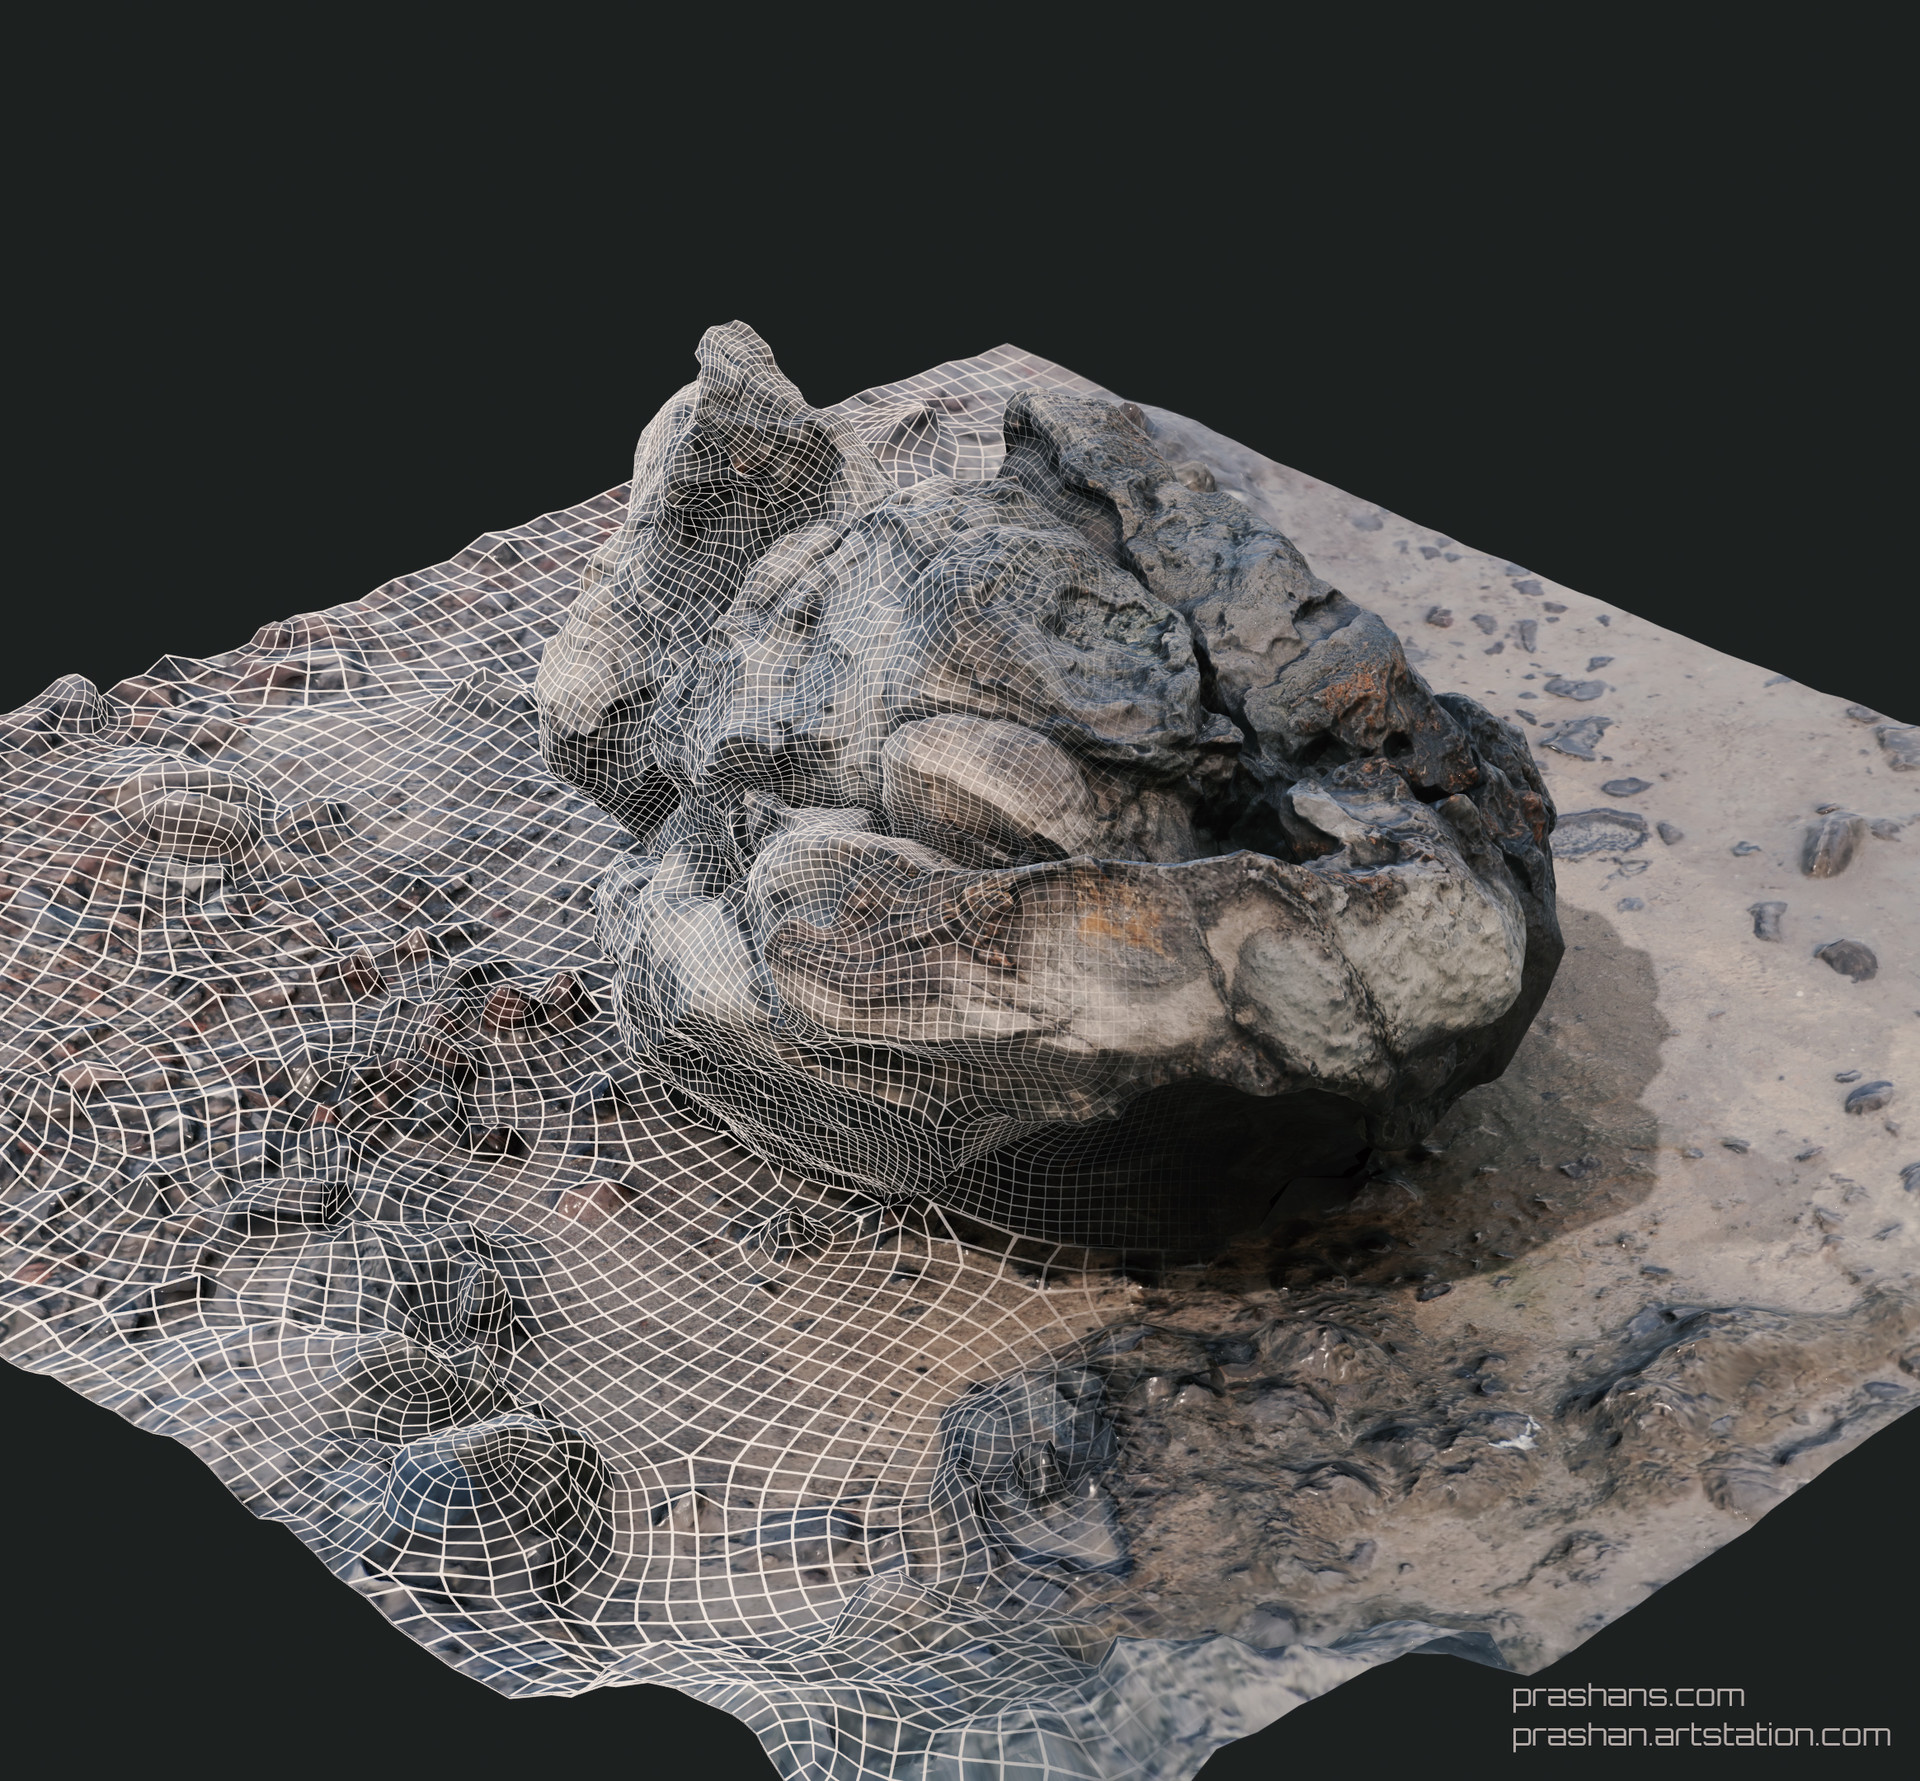 Prashan subasinghe rock scan 02e